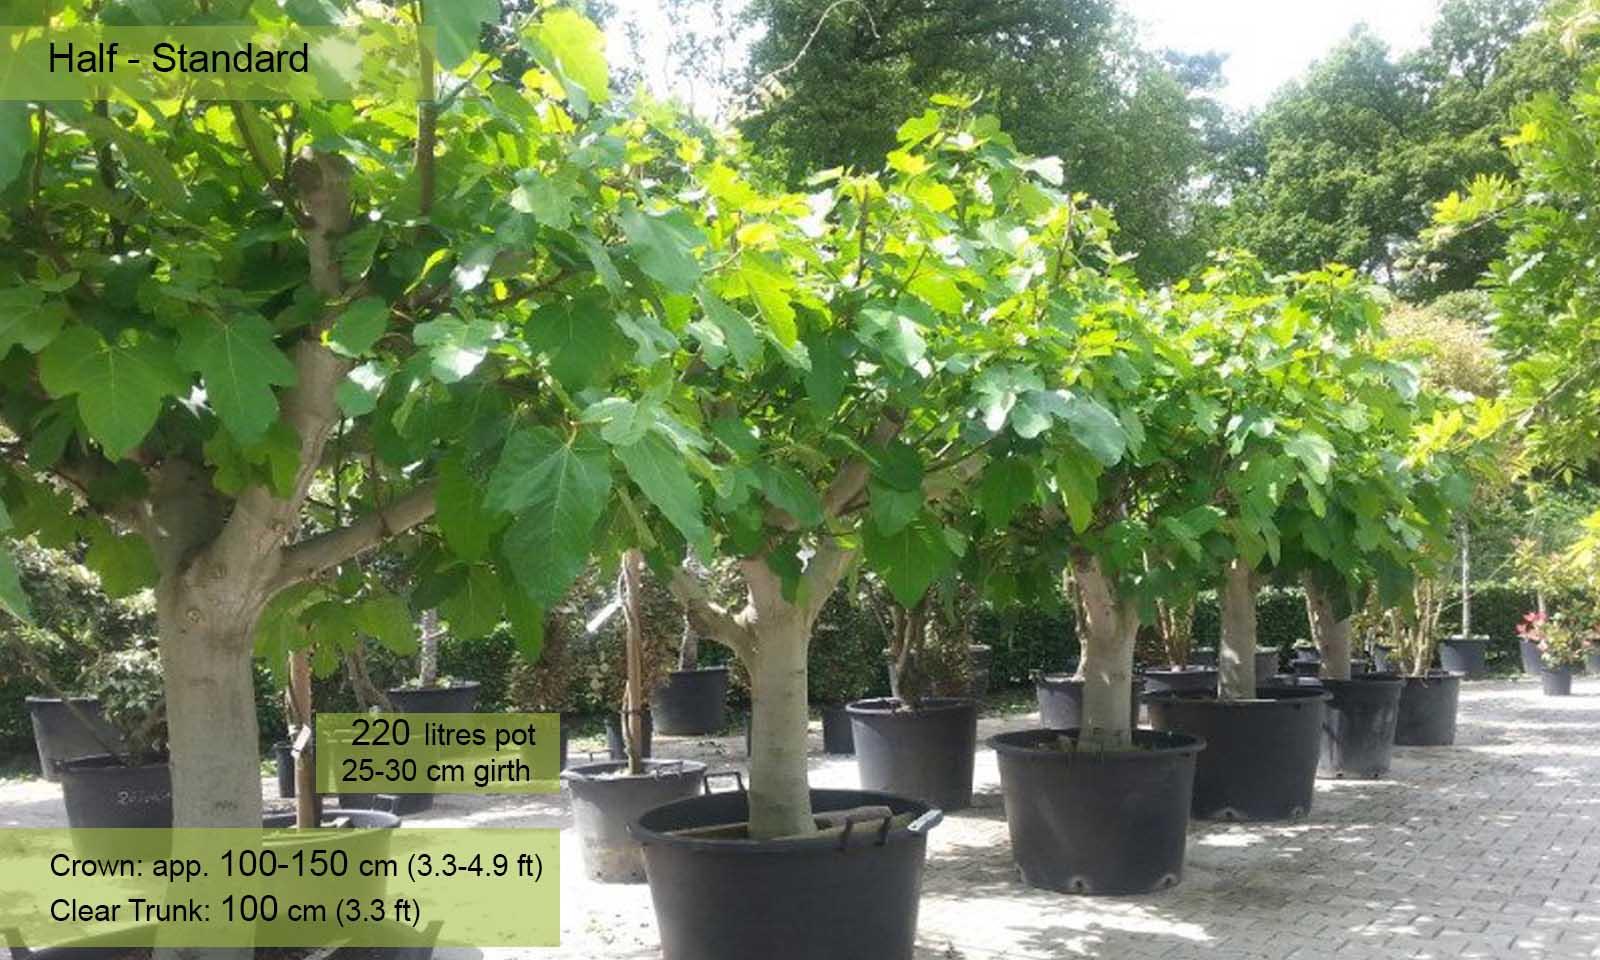 ficus carica brown turkey edible common fig tree half standard